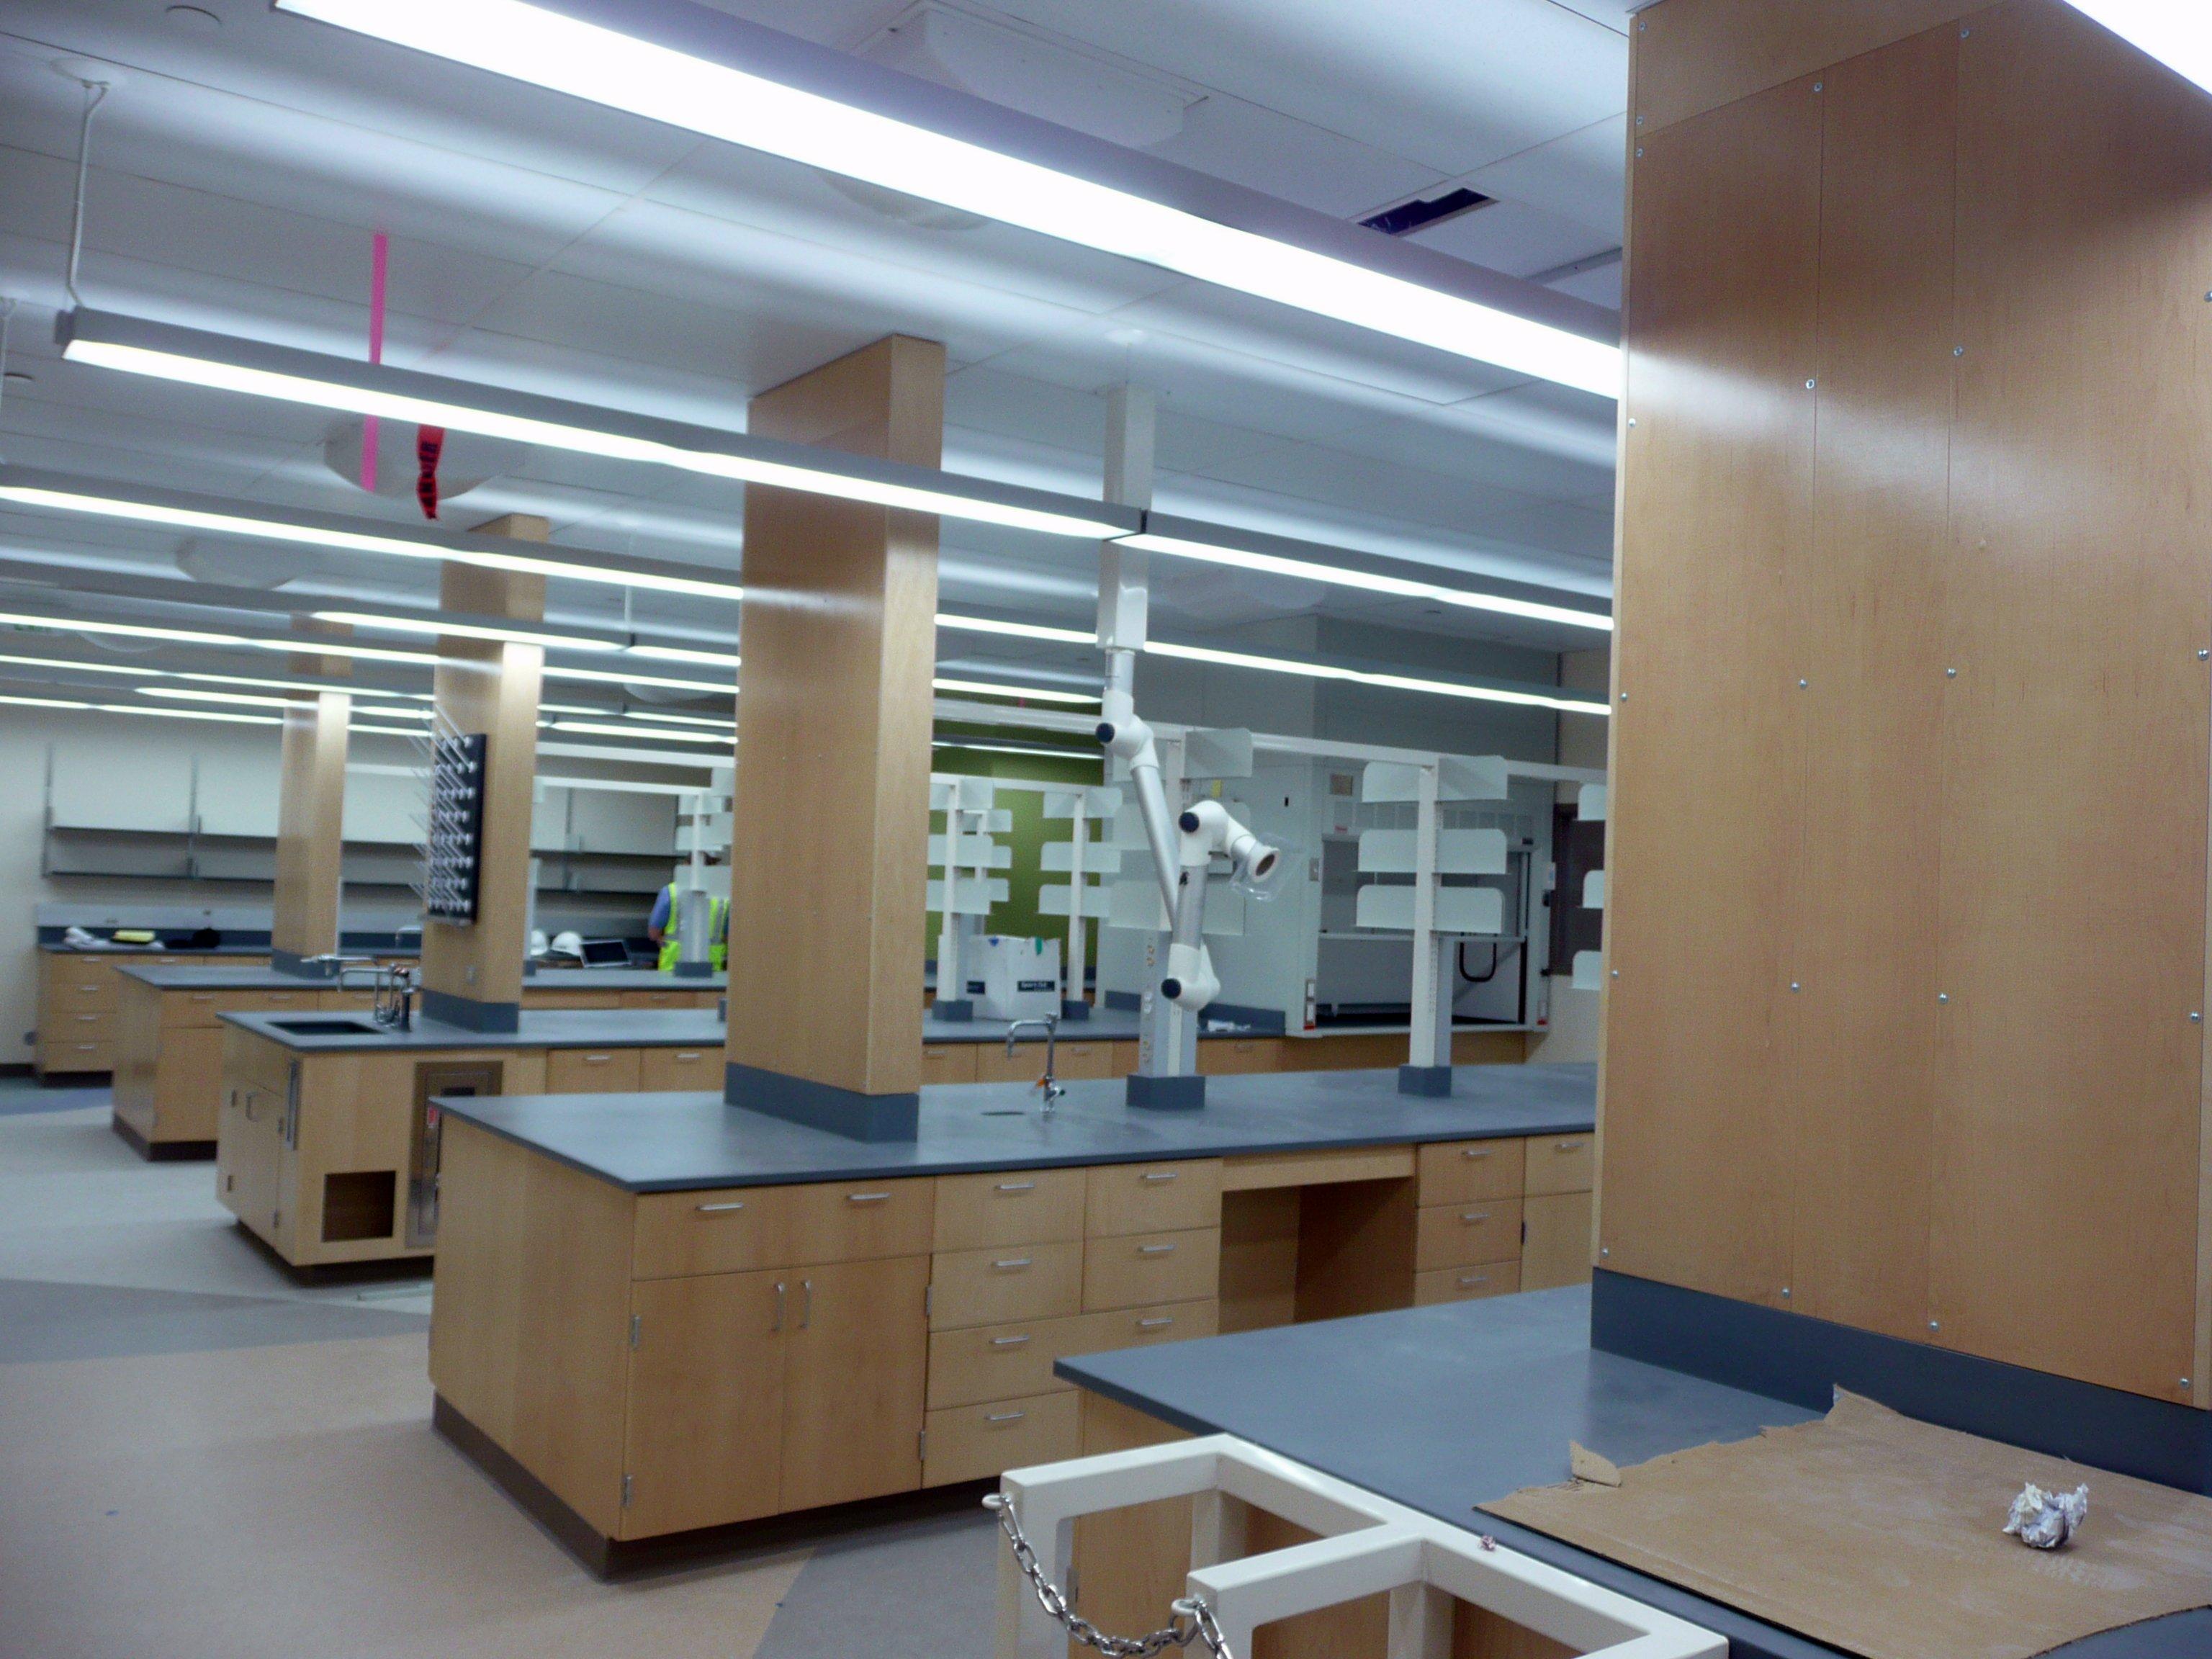 laboratory-wyoming-combined-3